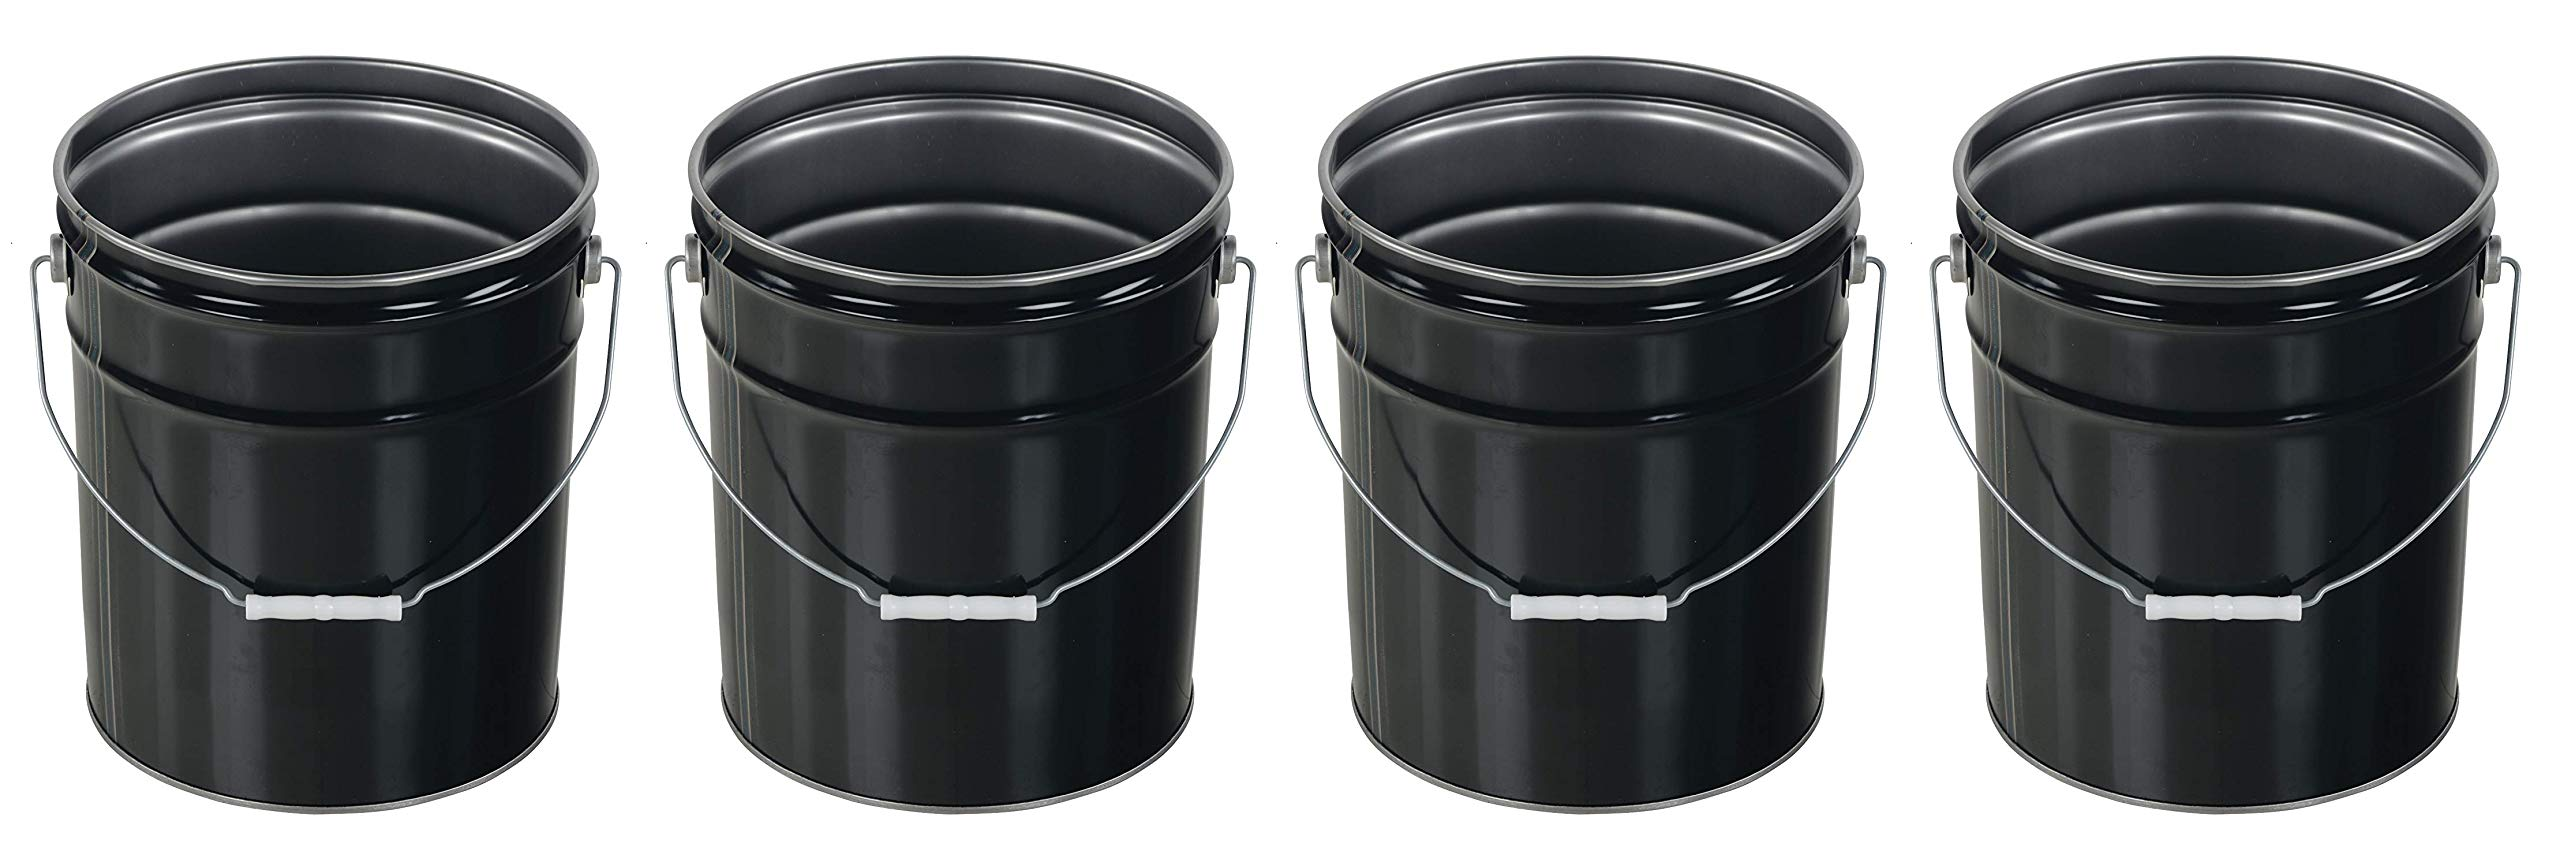 Vestil Pail-STL-RI Steel Open Head Pail with Handle, 5 Gallon Capacity, Black (Pack of 4)